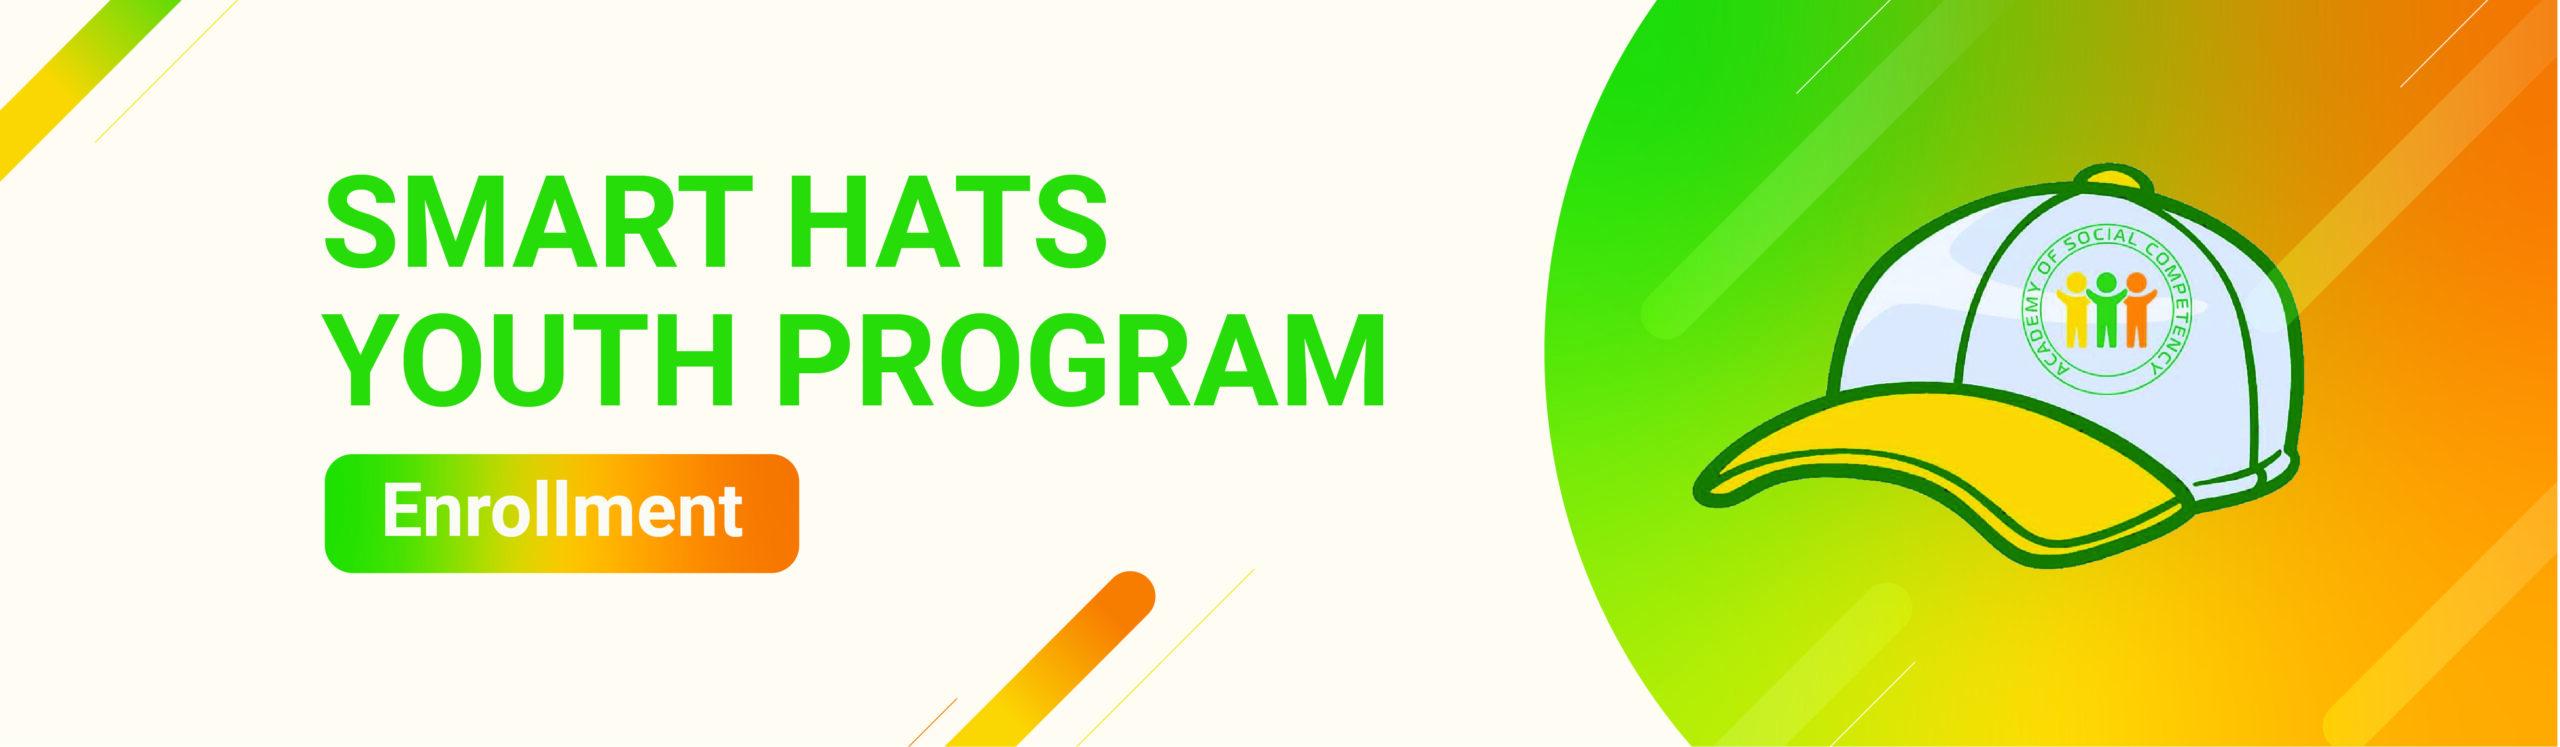 Enrollment   Smart Hats Youth Program